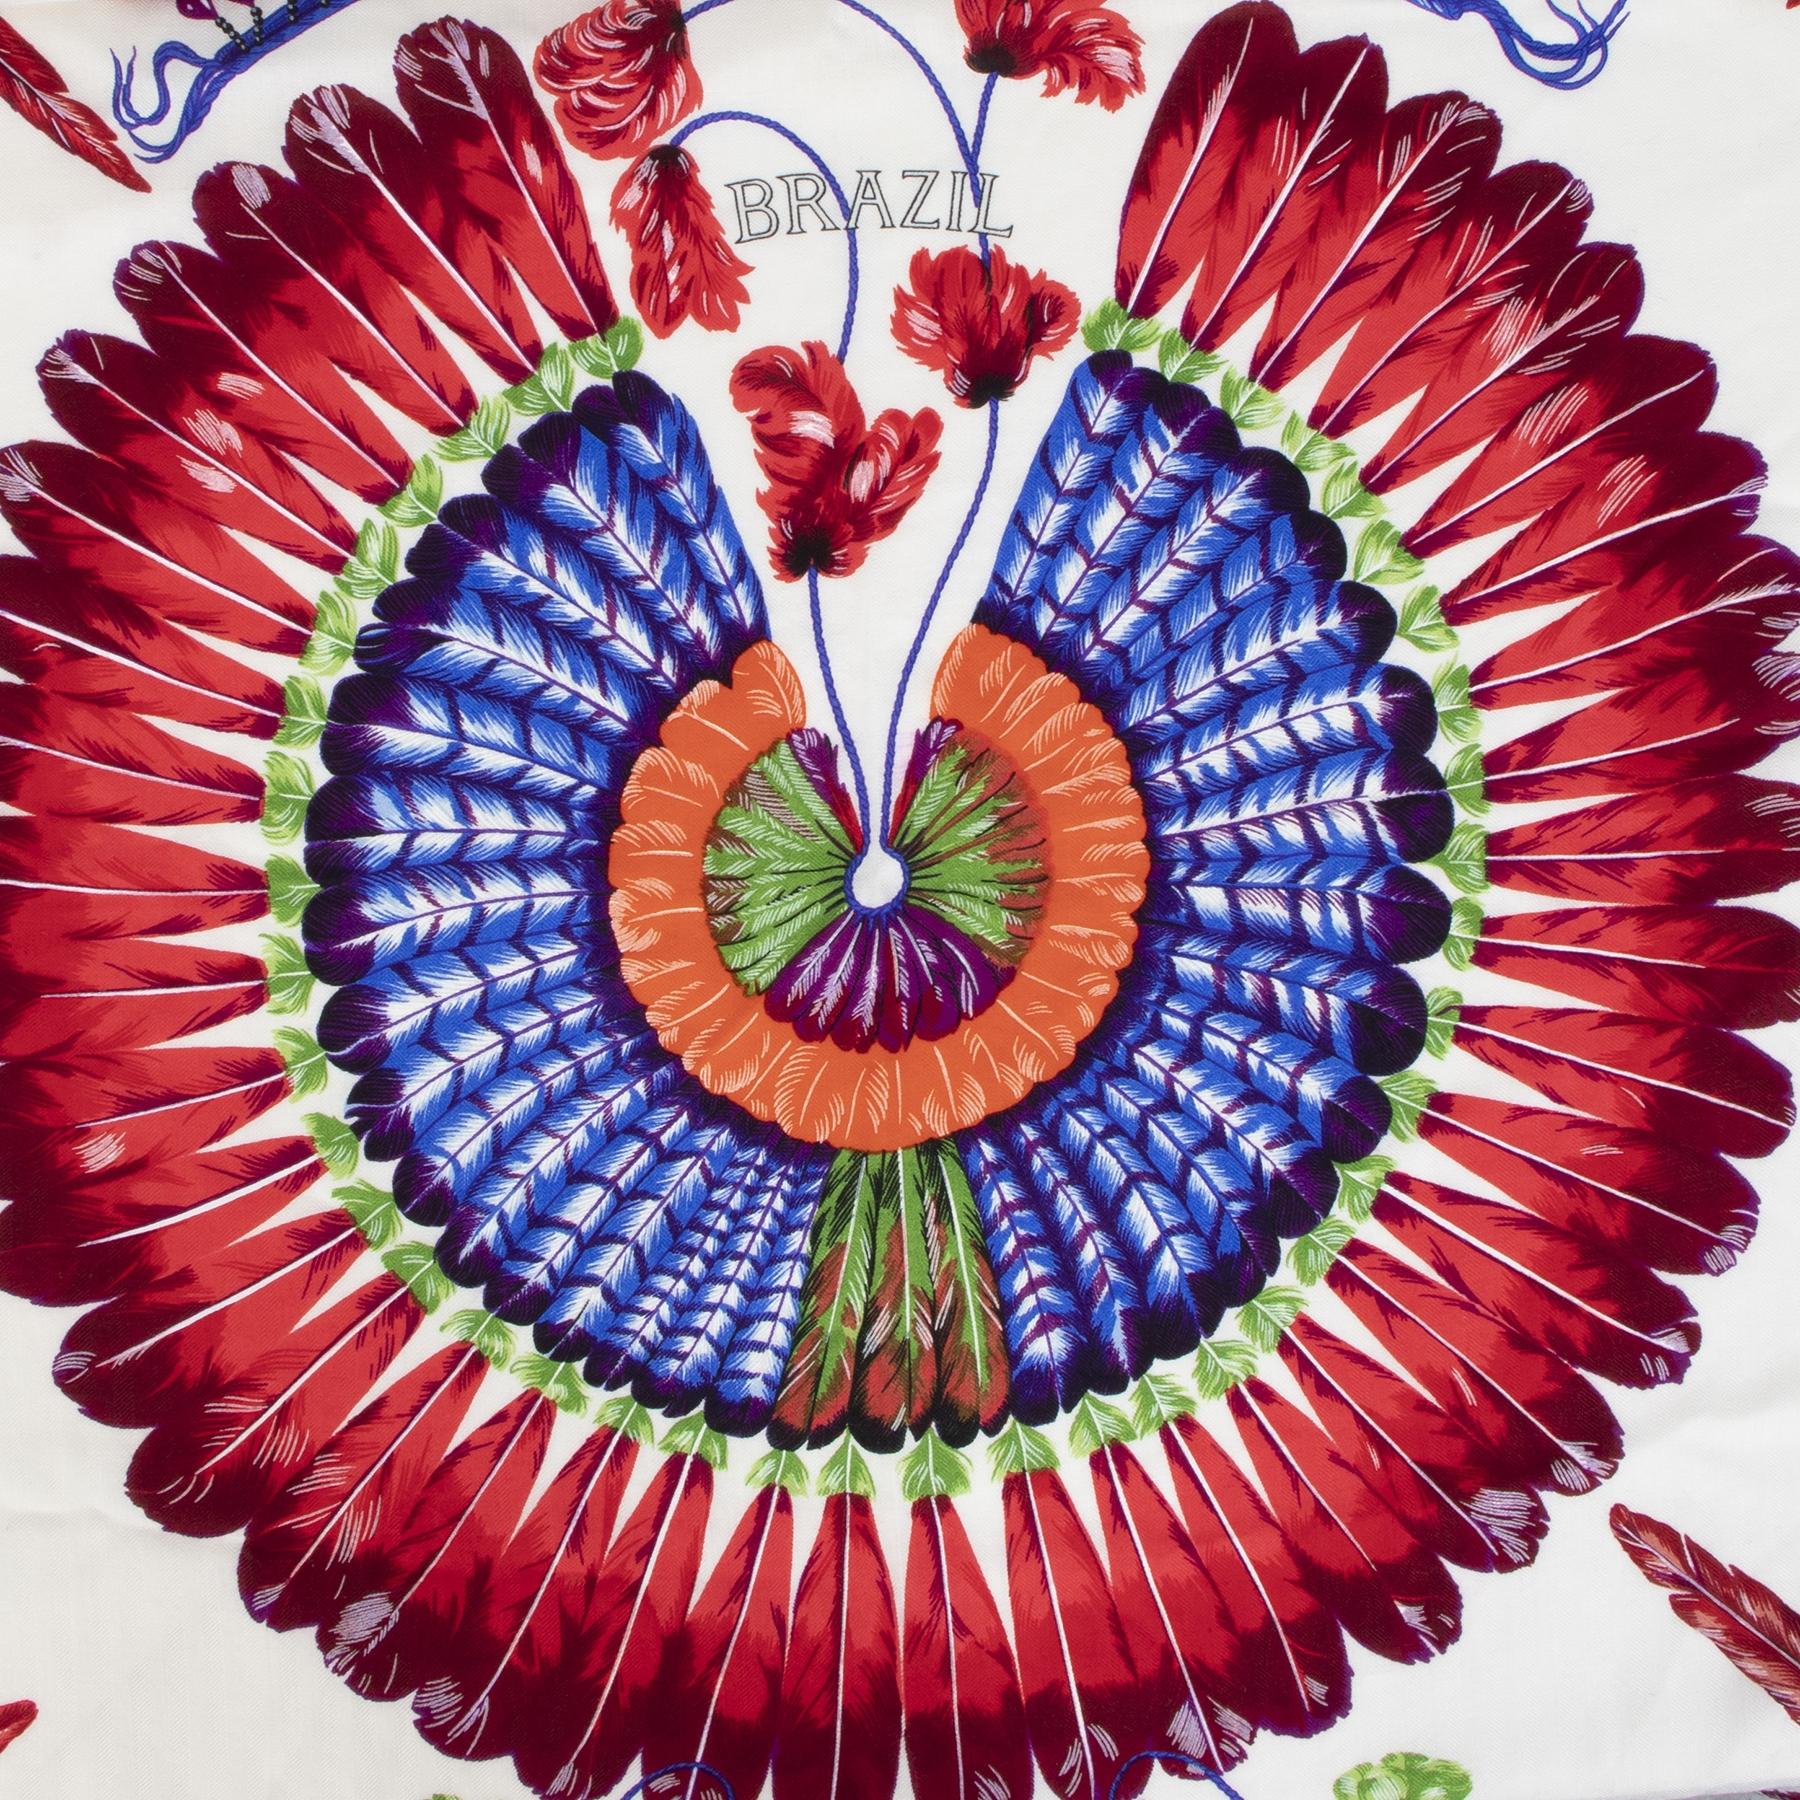 Authentic secondhand Hermès Brazil Cashmere Scarf designer accessories scarves designer brands fashion luxury vintage webshop safe secure online shopping worldwide shipping delivery